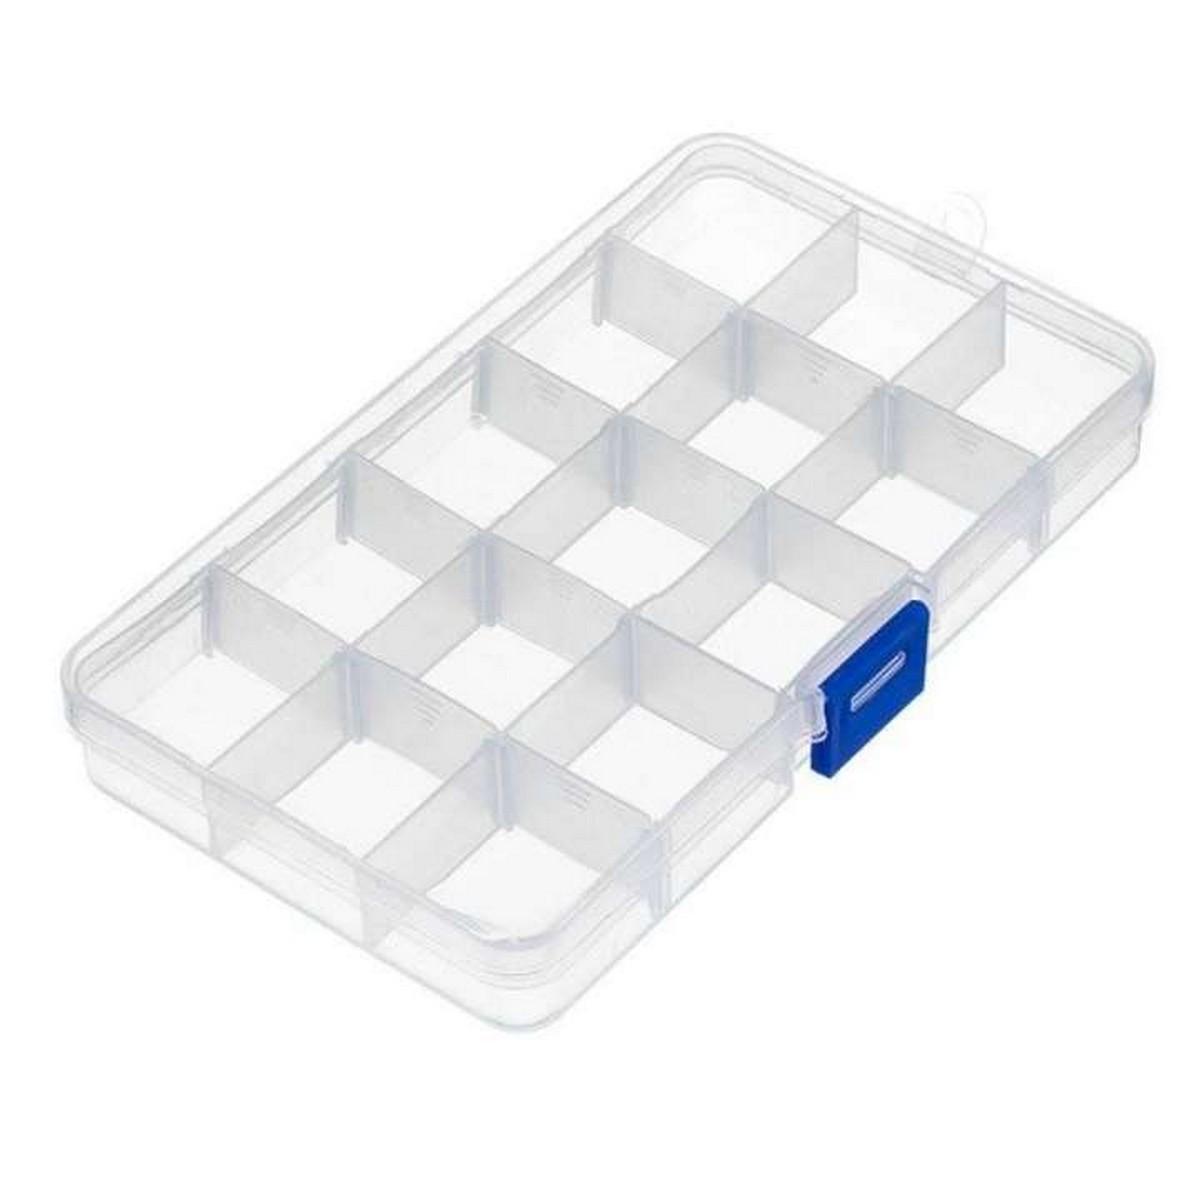 Bead Storage Box, Adjustable Jewelry Organizer Plastic Screw Container